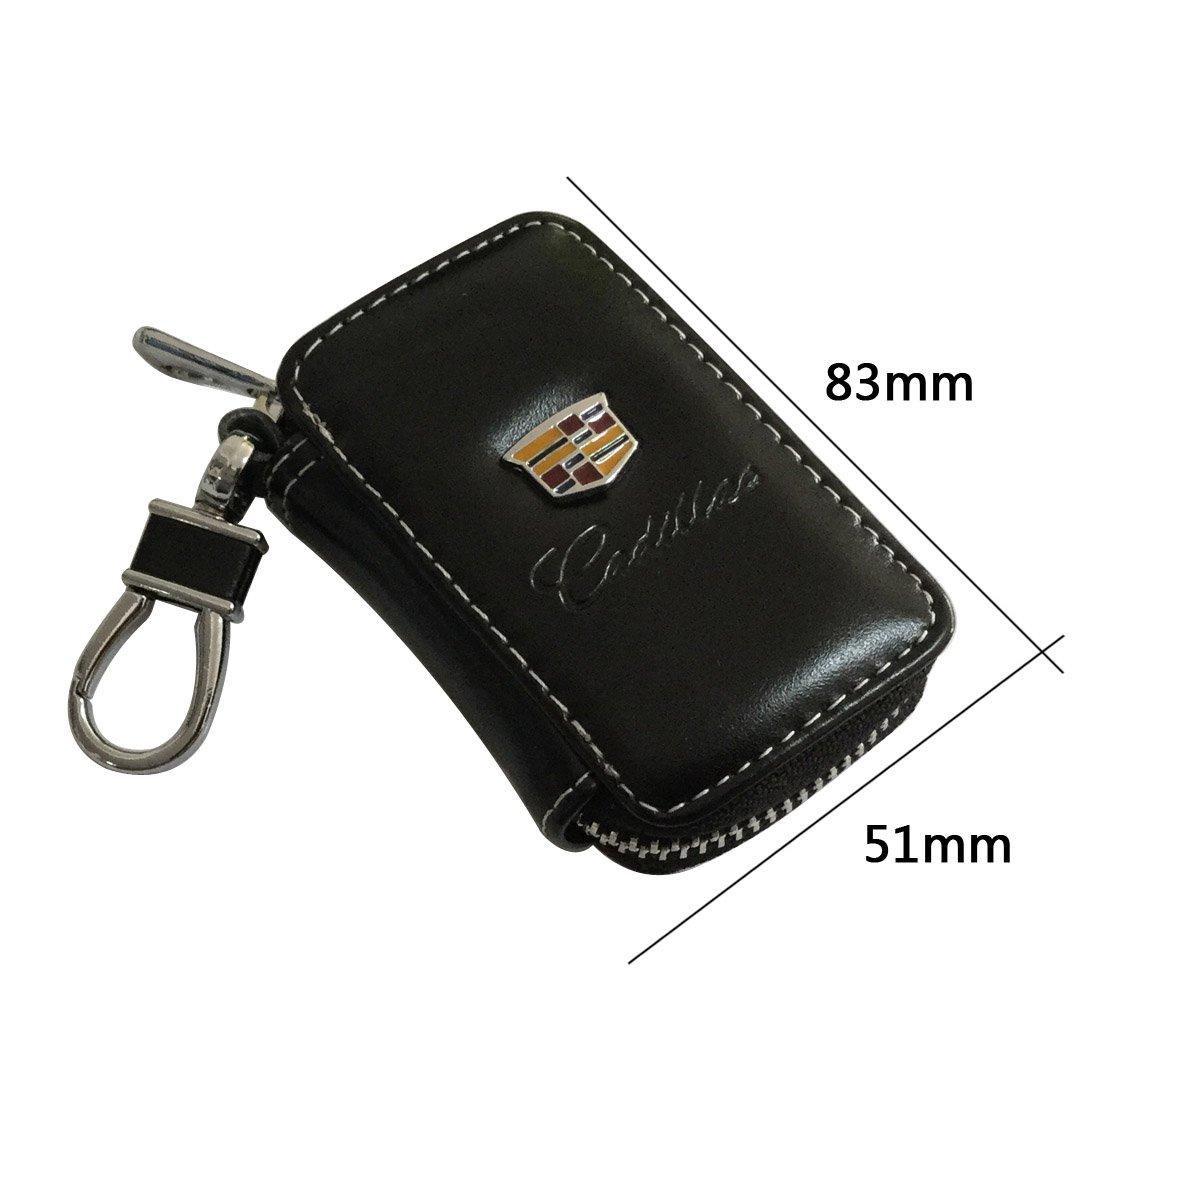 1pcs New Cadillac Black Premium Leather Car KeyChain Zipper Case Remote Wallet Bag Fit For Cadillac TNB New 1pcs Cadillac Keychain Lanyard Badge Holder